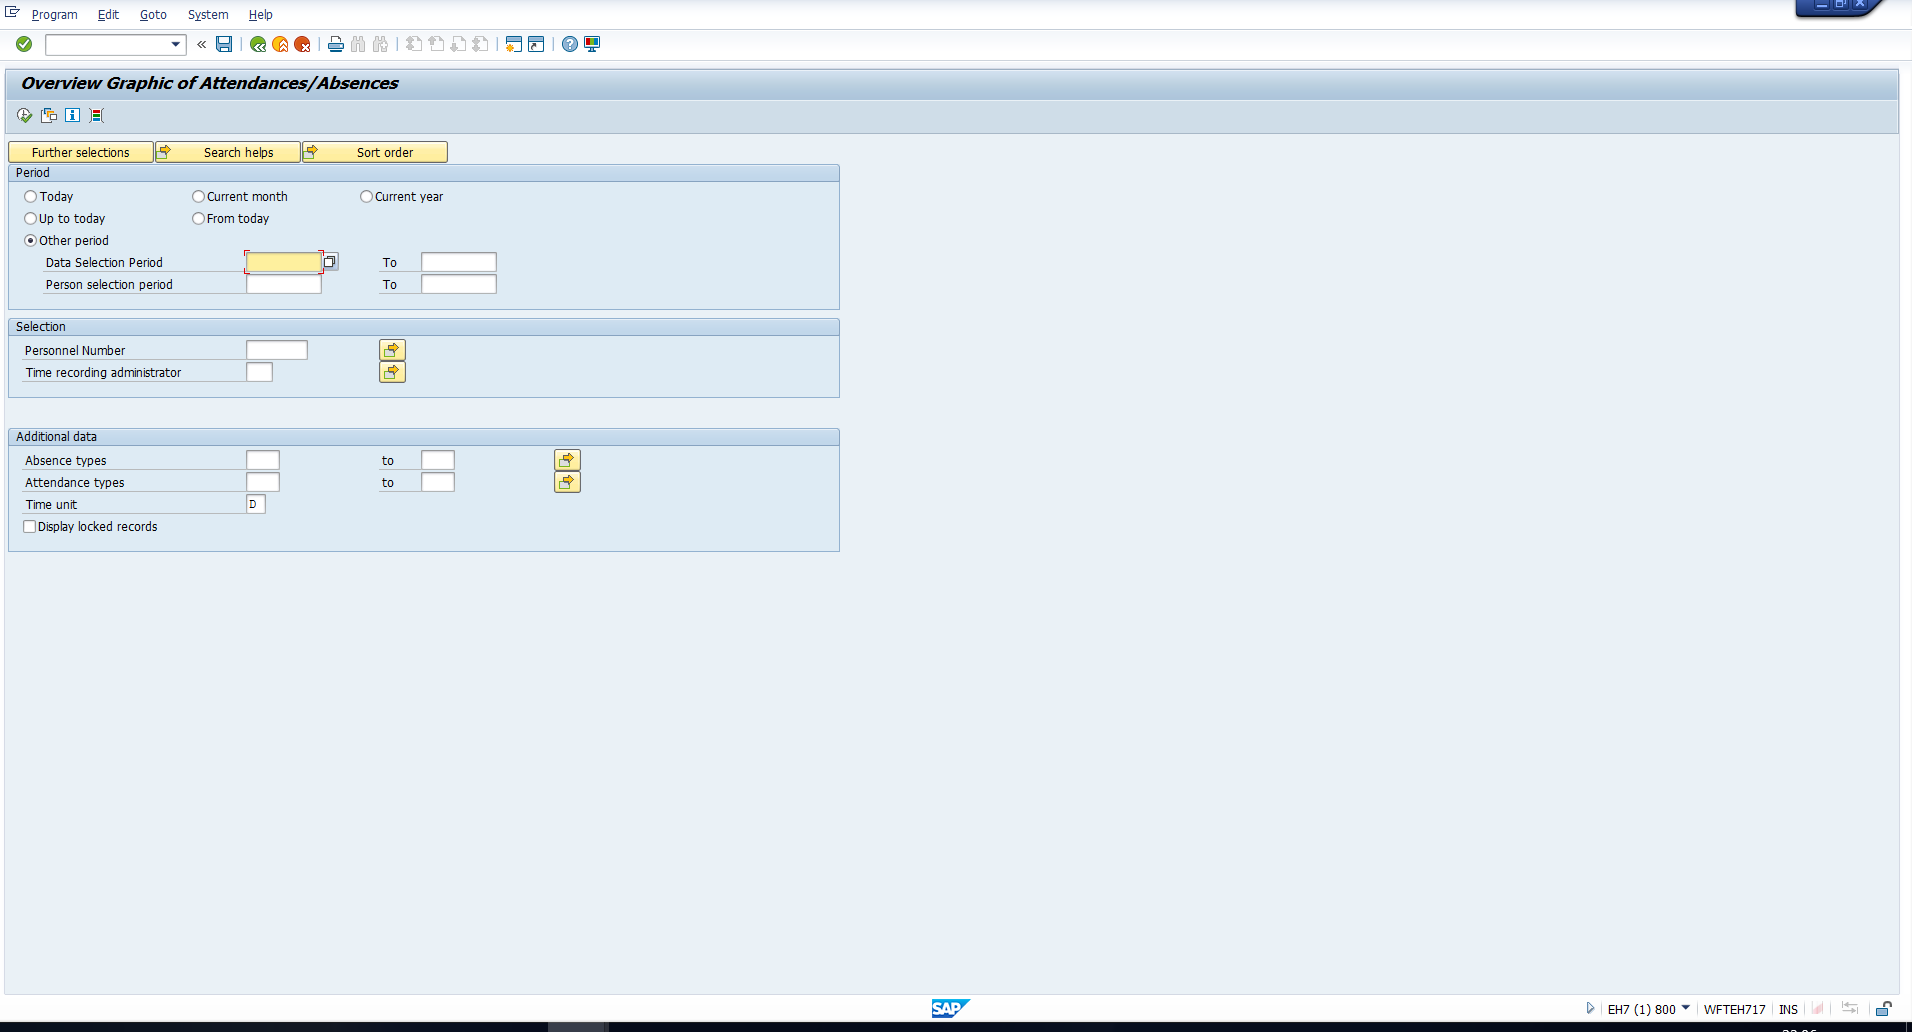 Figure 17: Selection Screen